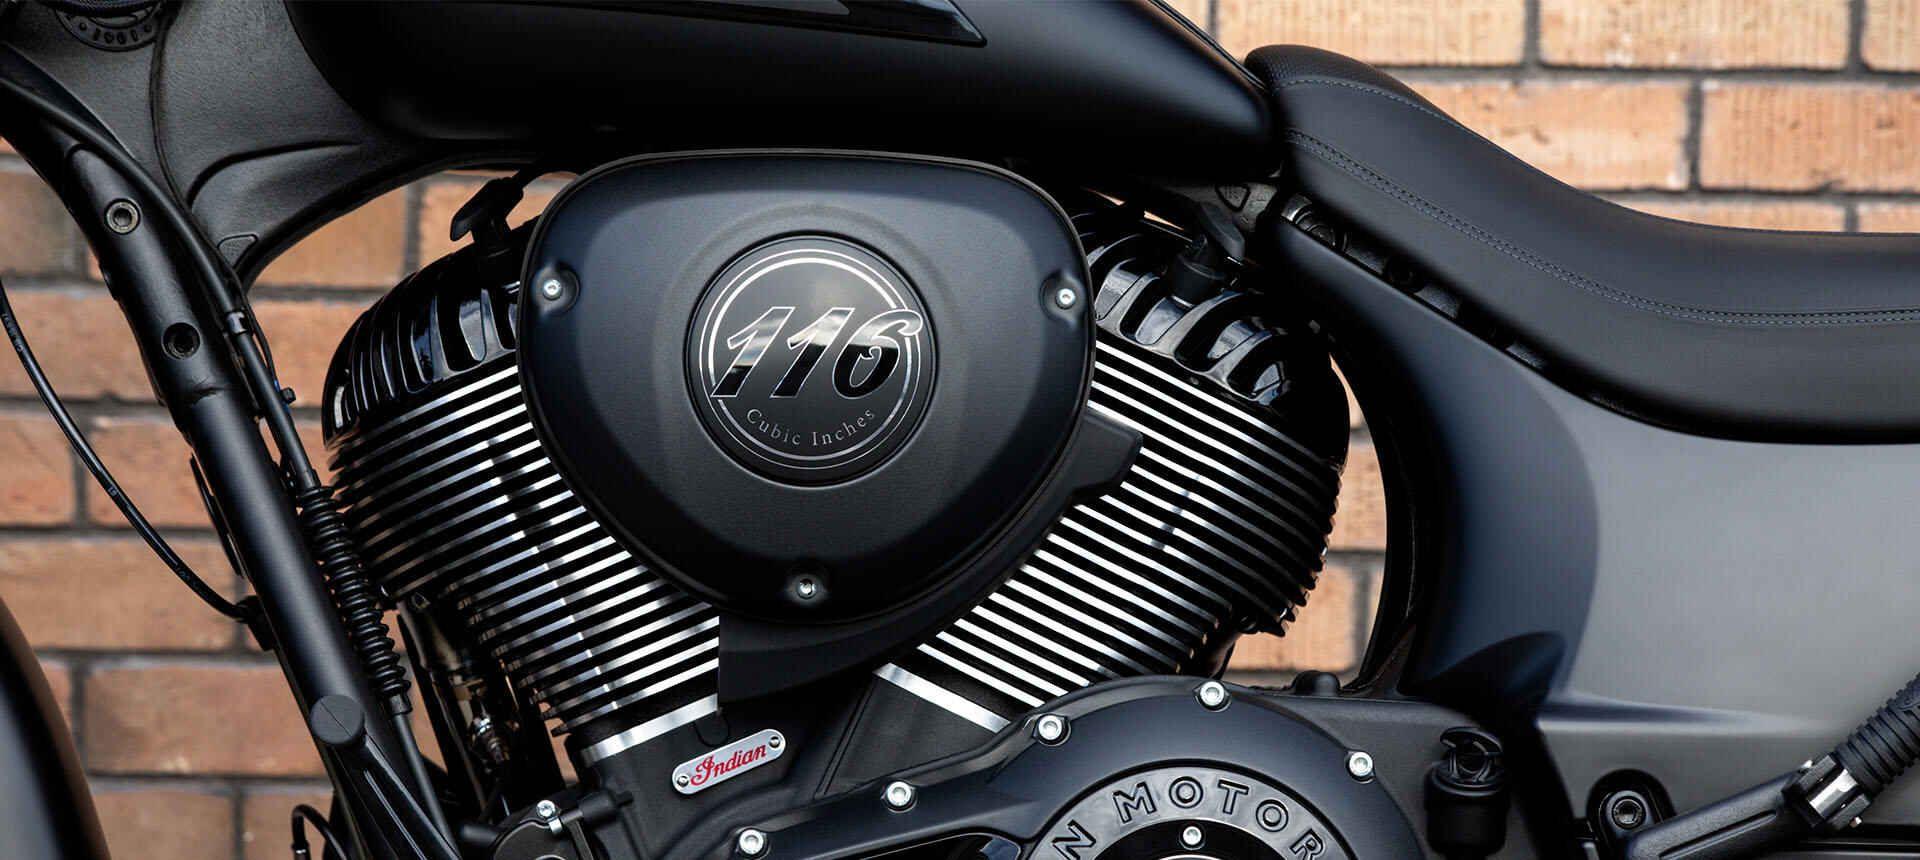 Мотоцикл Indian Springfield Dark Horse Sagebrush Smoke 2020 - 5